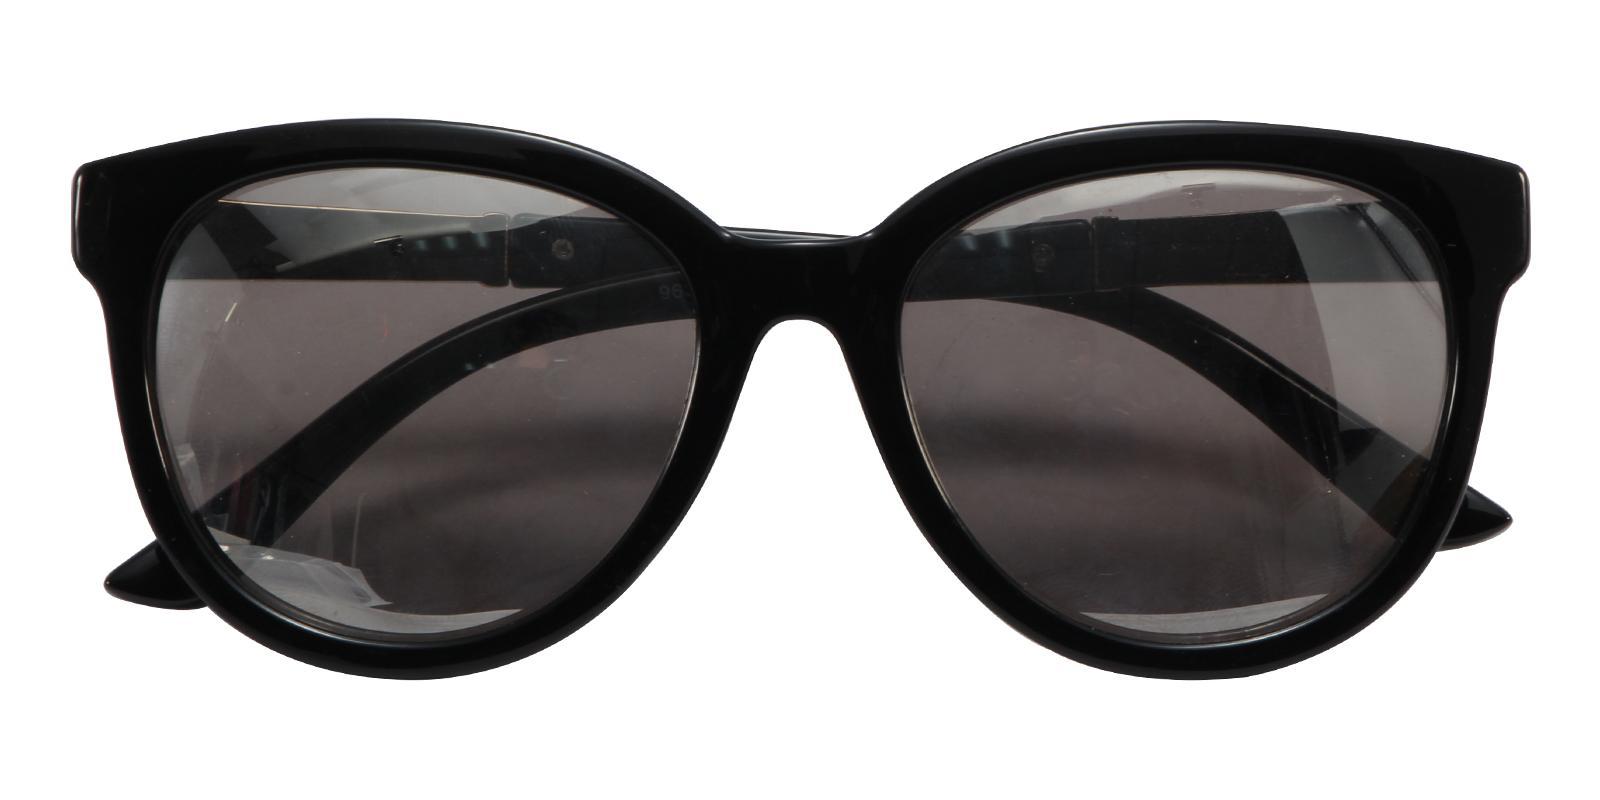 Bay Black Acetate Sunglasses , UniversalBridgeFit Frames from ABBE Glasses